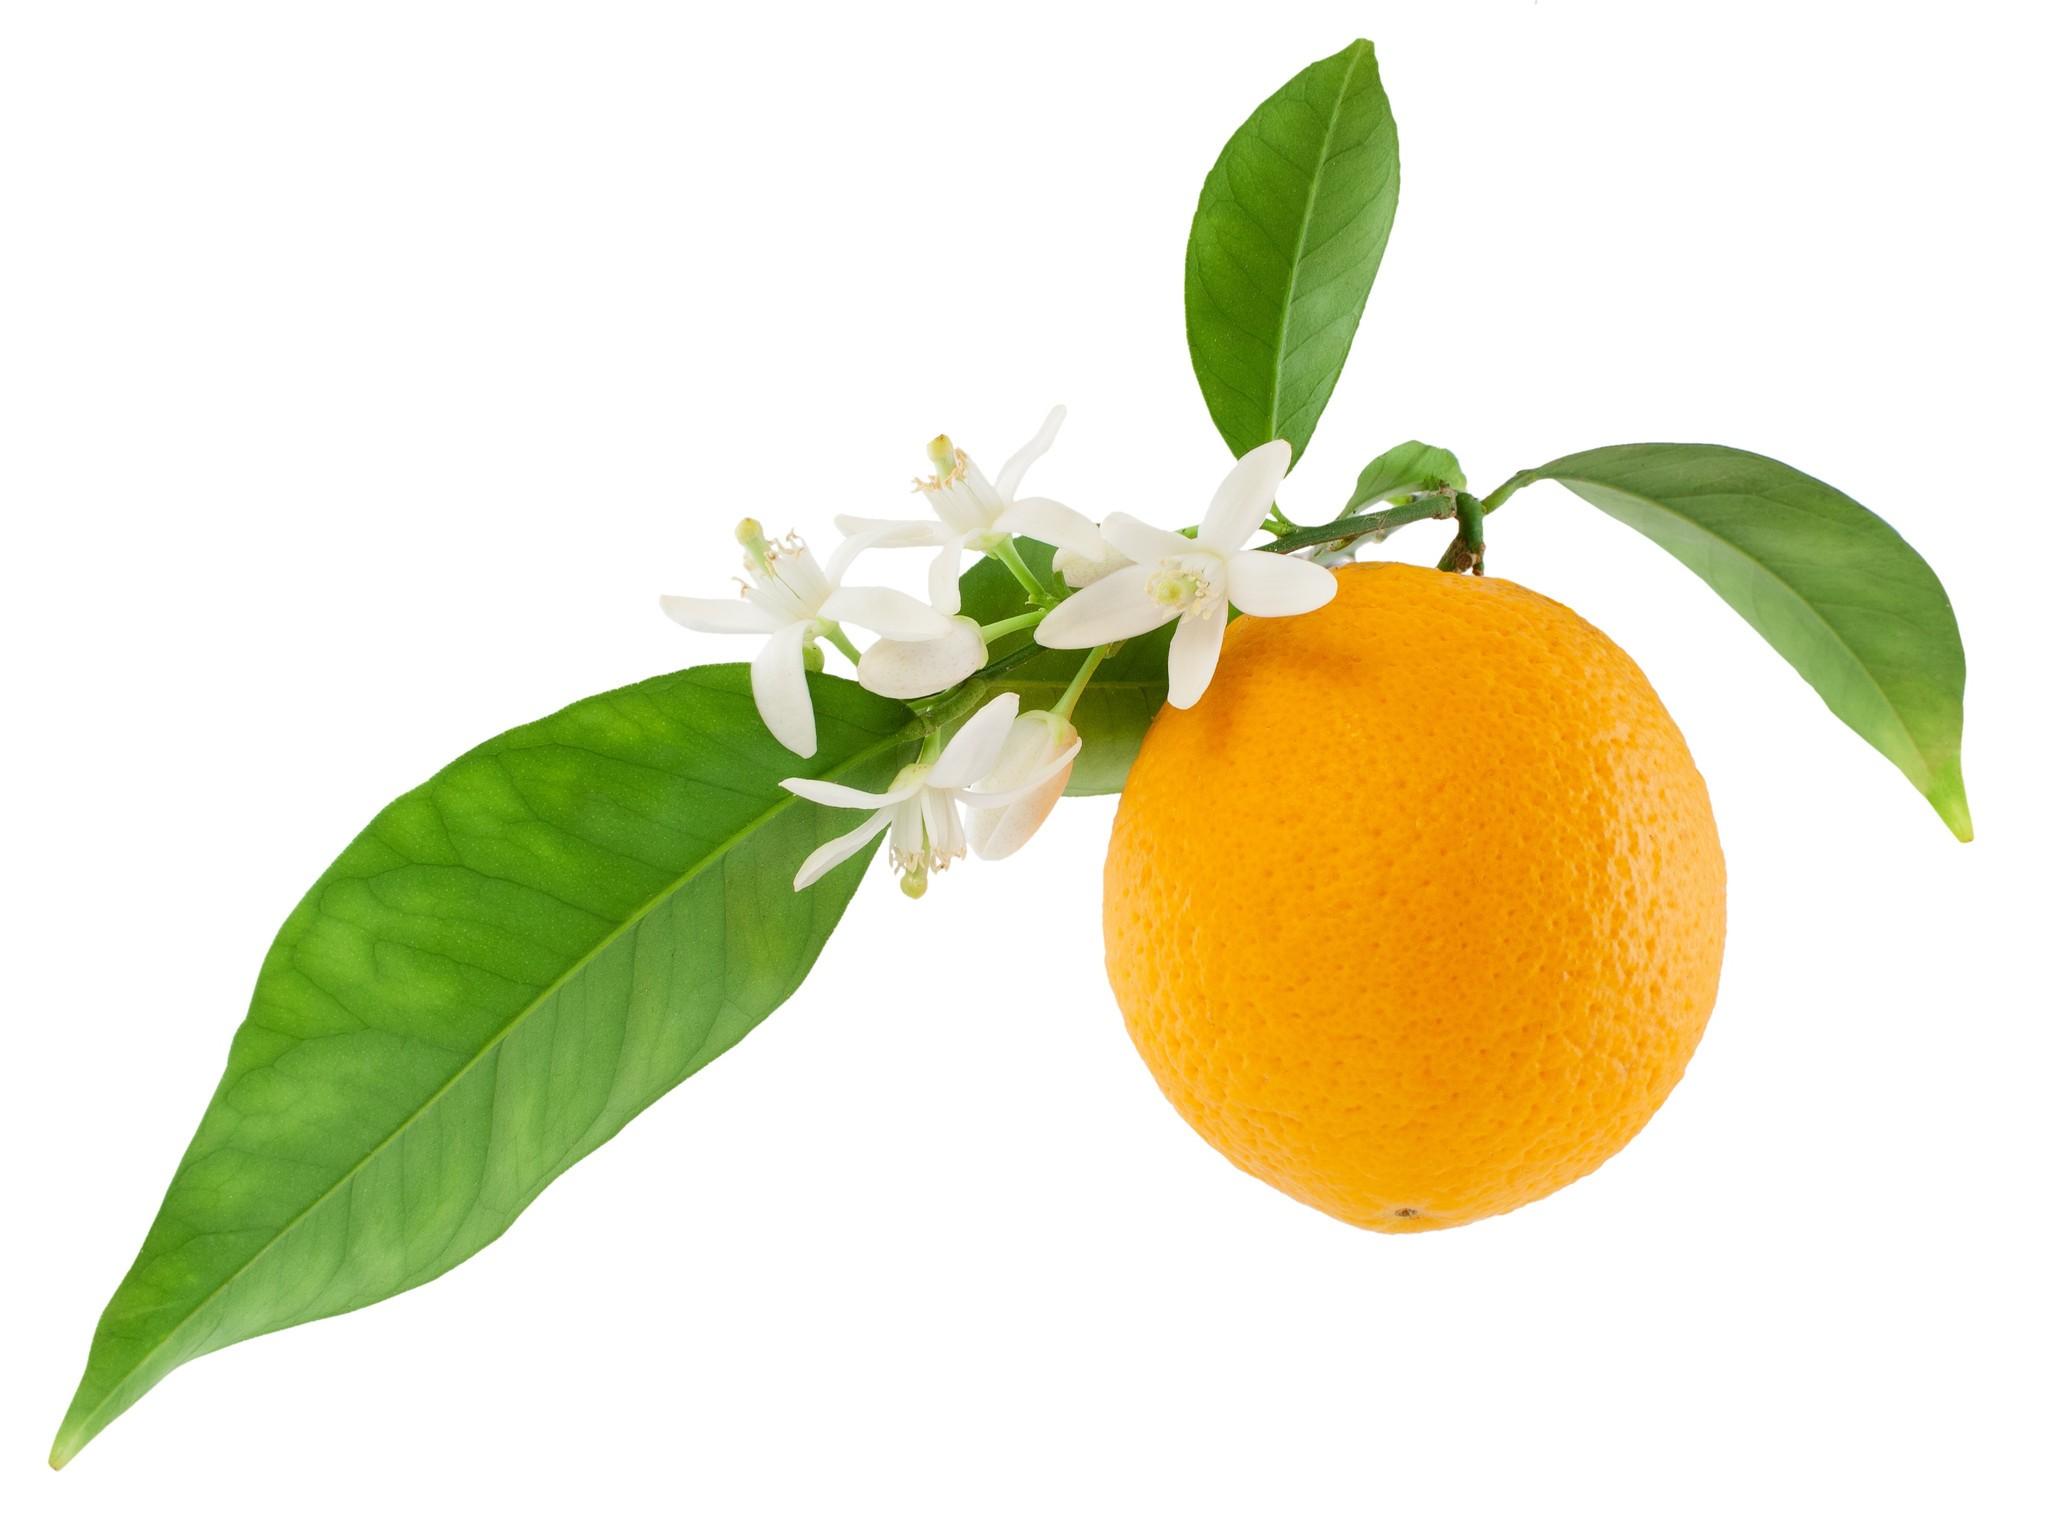 Гидролат петитгрейна/Citrus reticulata blanco var. clementine (Франция)